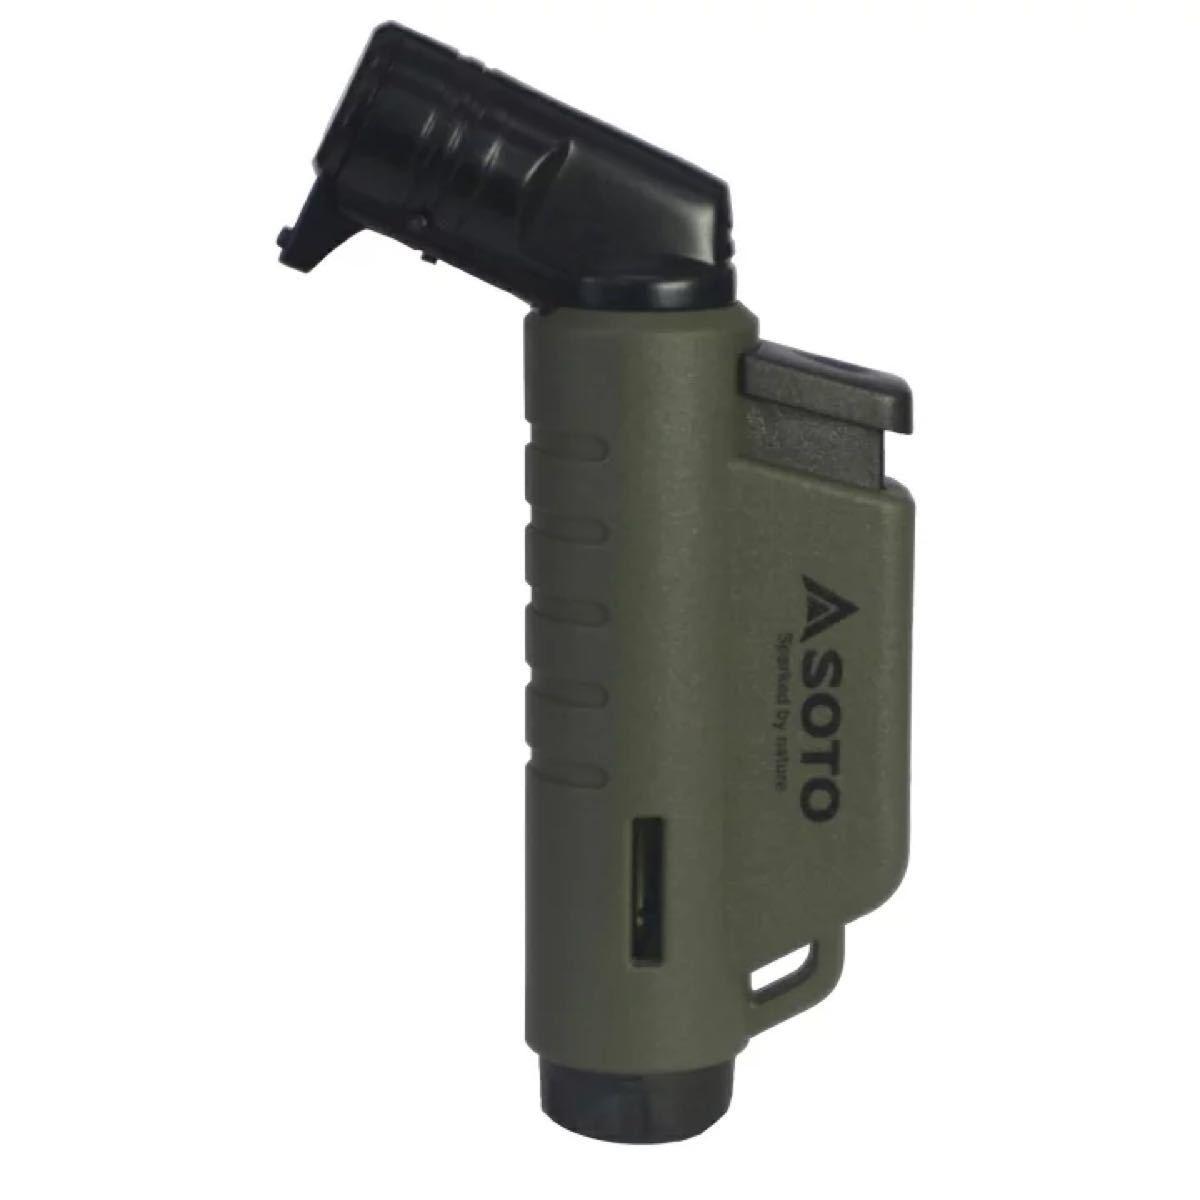 SOTO(ソト) 限定マイクロトーチ アーミーグリーン キャンプ用品 ガスバーナー ST-486AG 3個セット